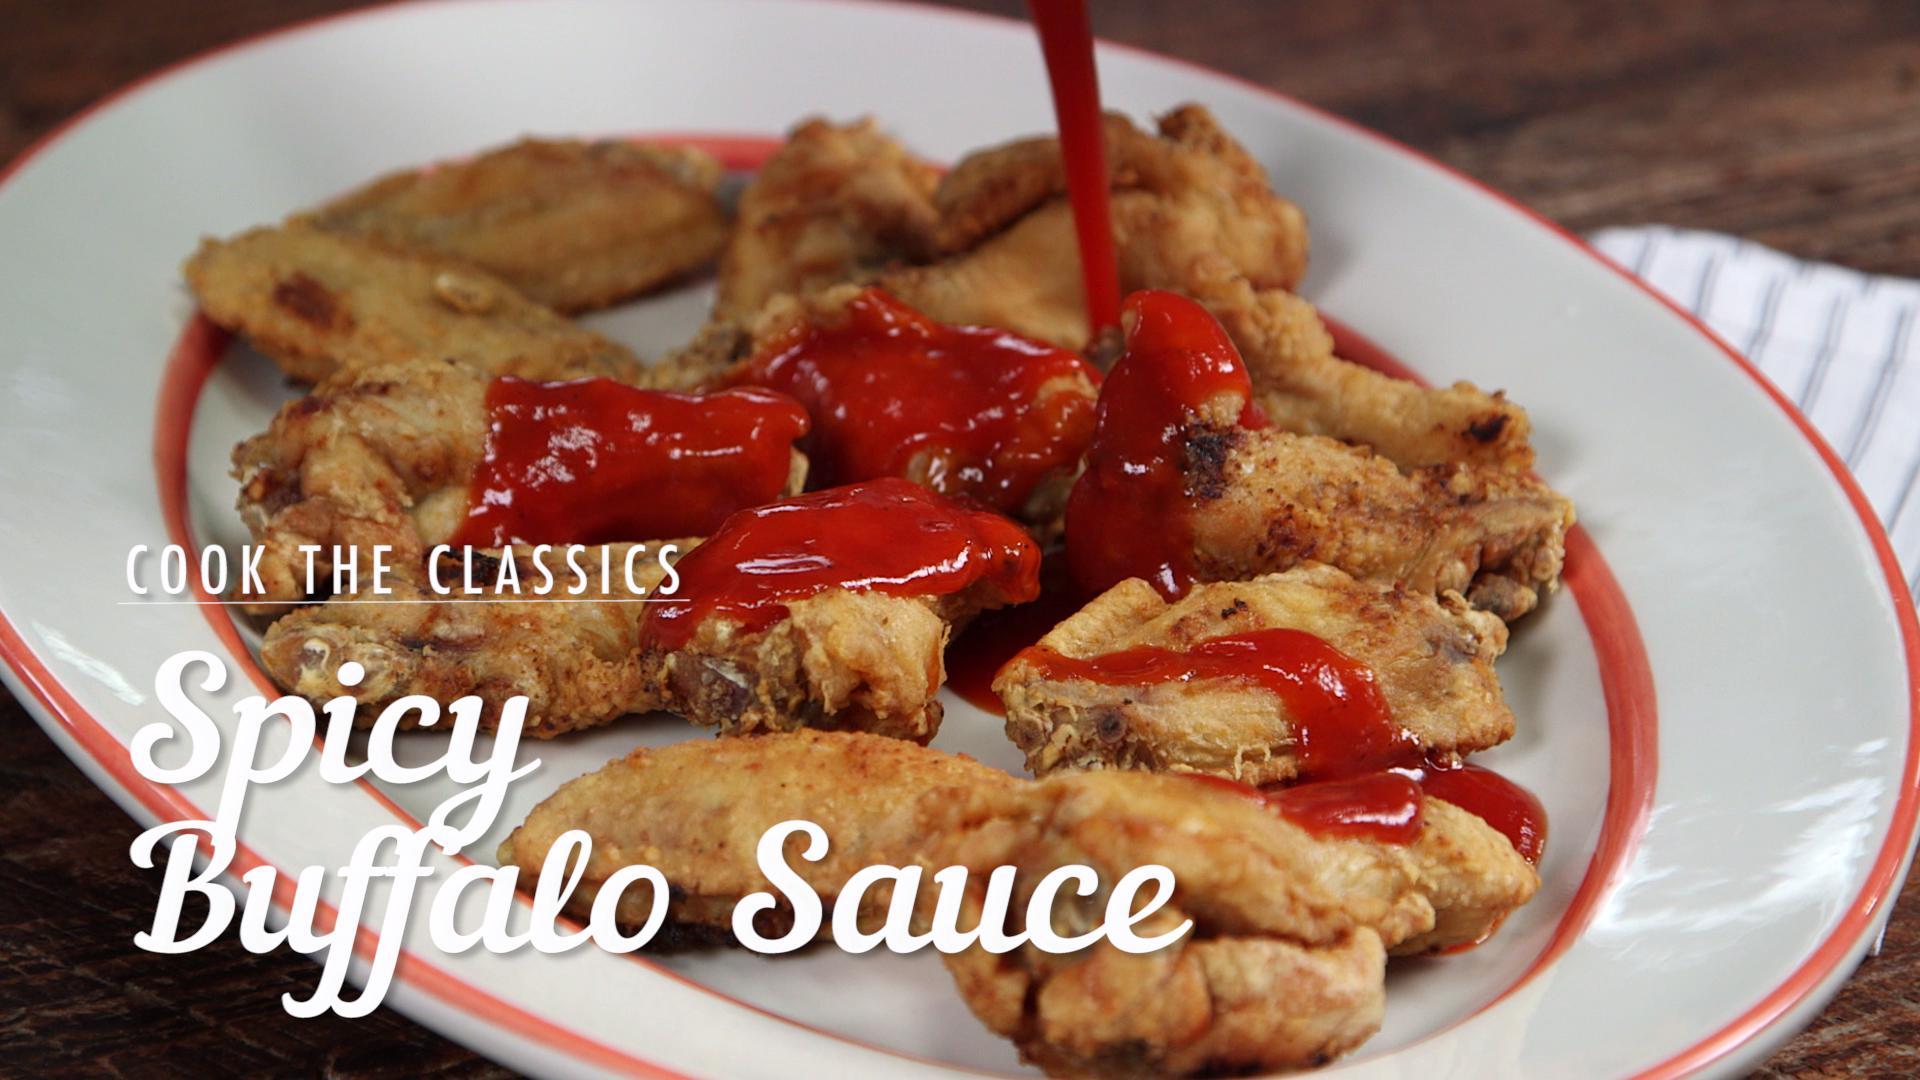 Spicy Buffalo Sauce